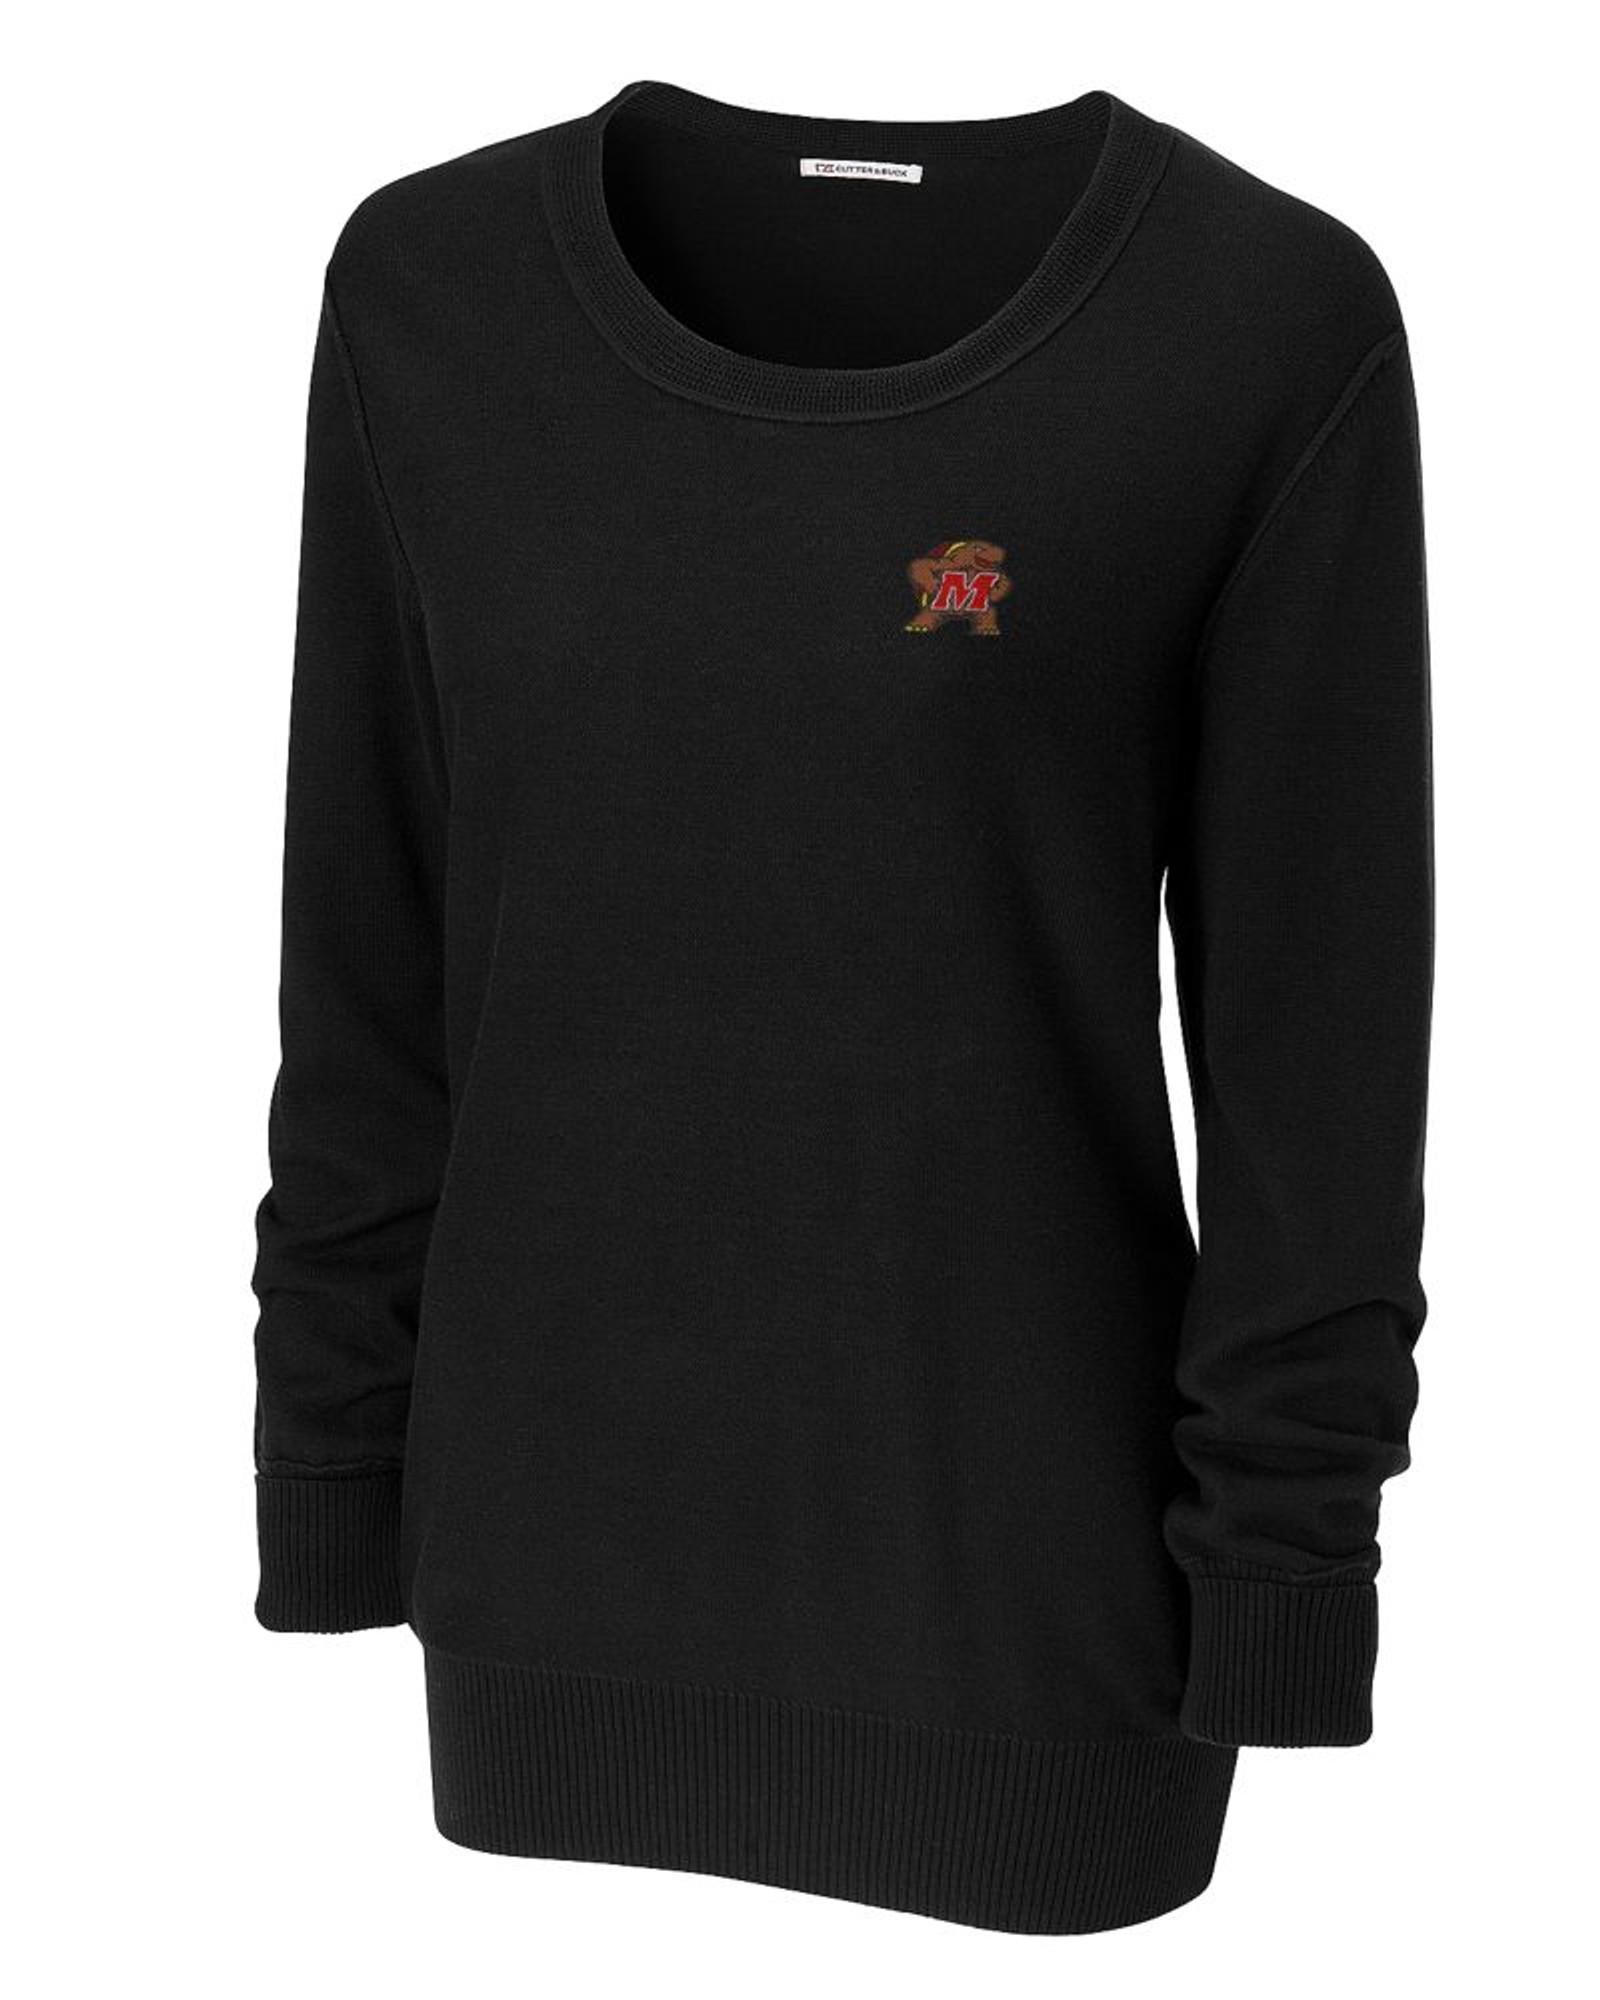 University of Maryland Terrapins Women s Broadview Scoop Neck Sweater d504d46a2